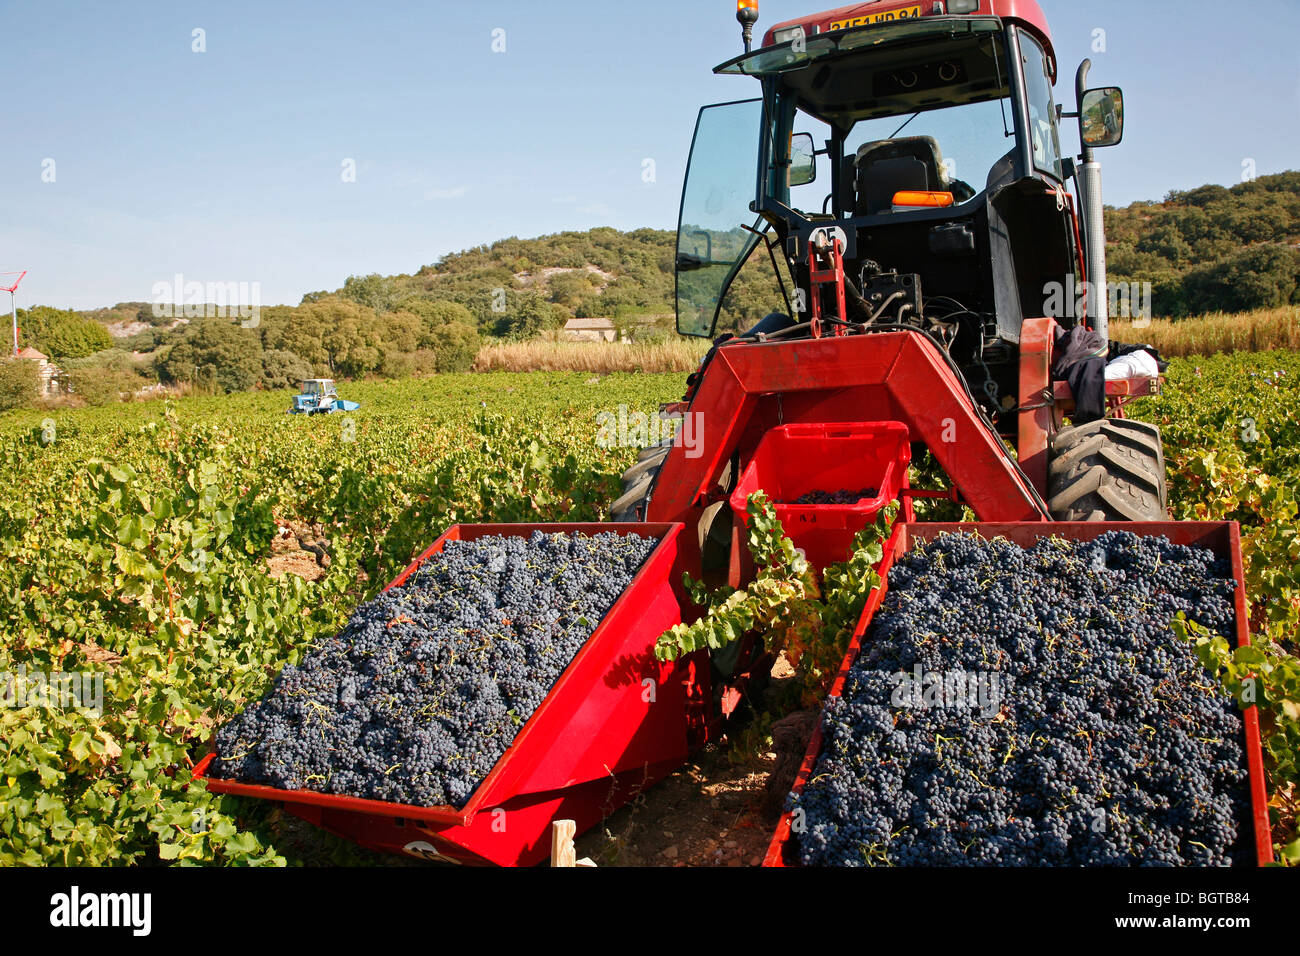 Grape harvest in vineyards around Chateauneuf du Pape, Vaucluse, Provence, France. - Stock Image